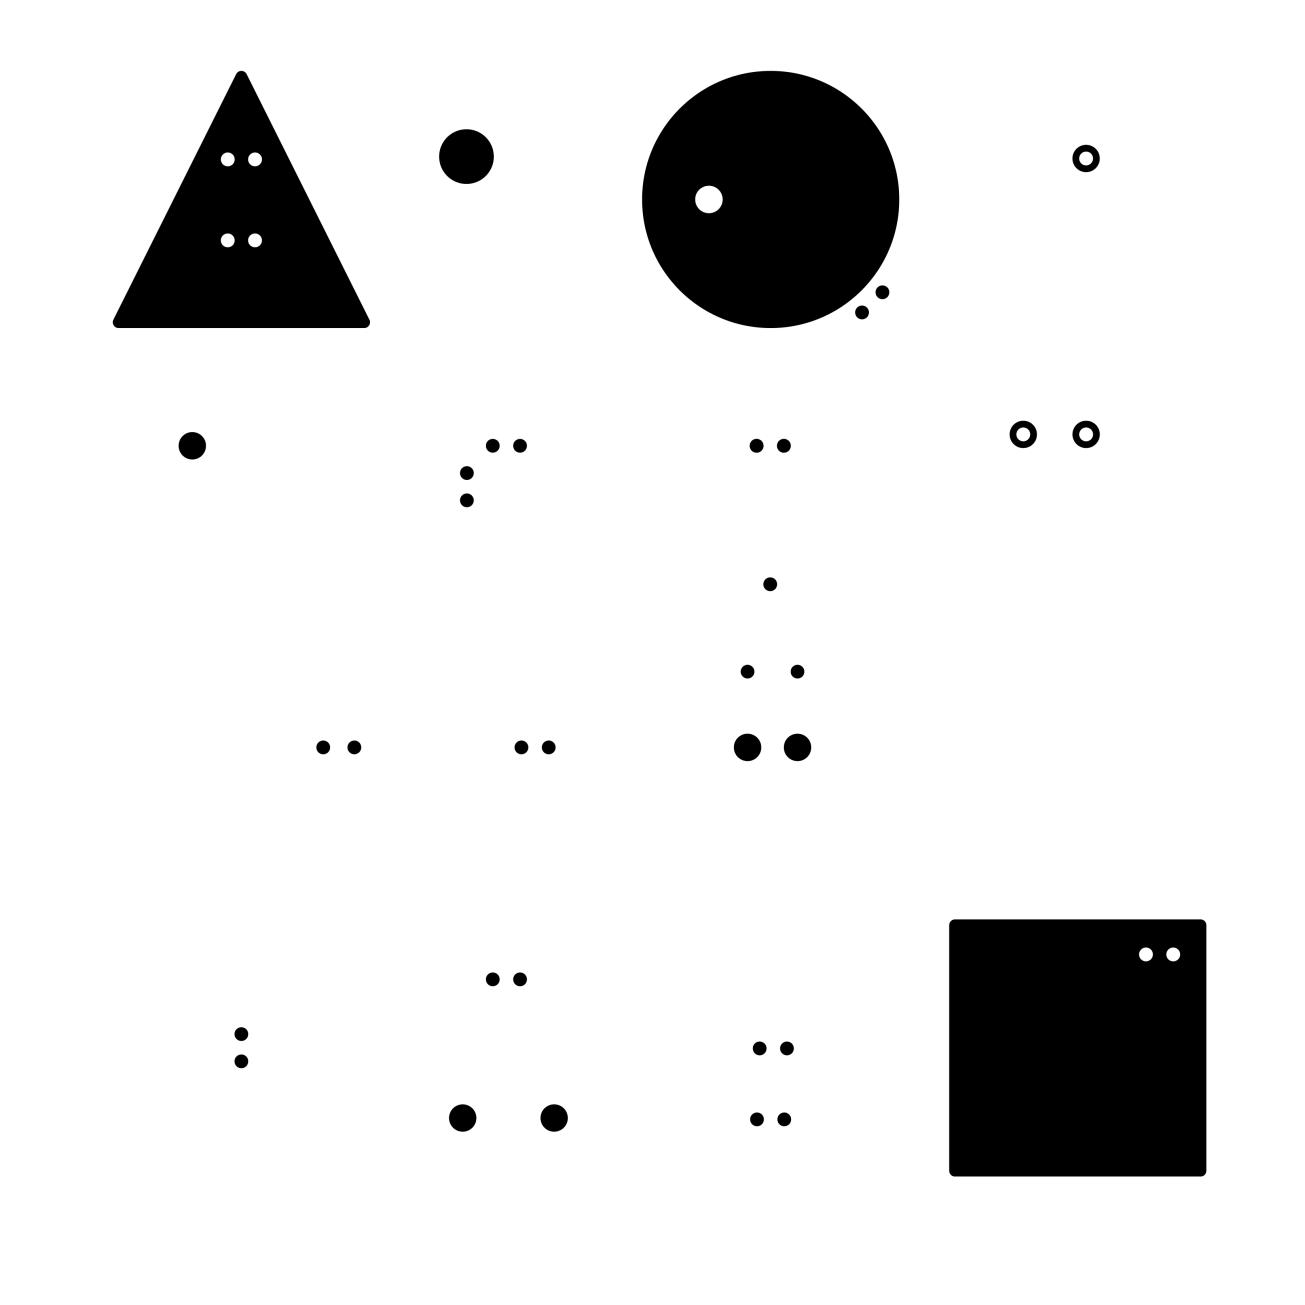 Djecà-Alphabet-Graphisme-LaurenceChene-3-01